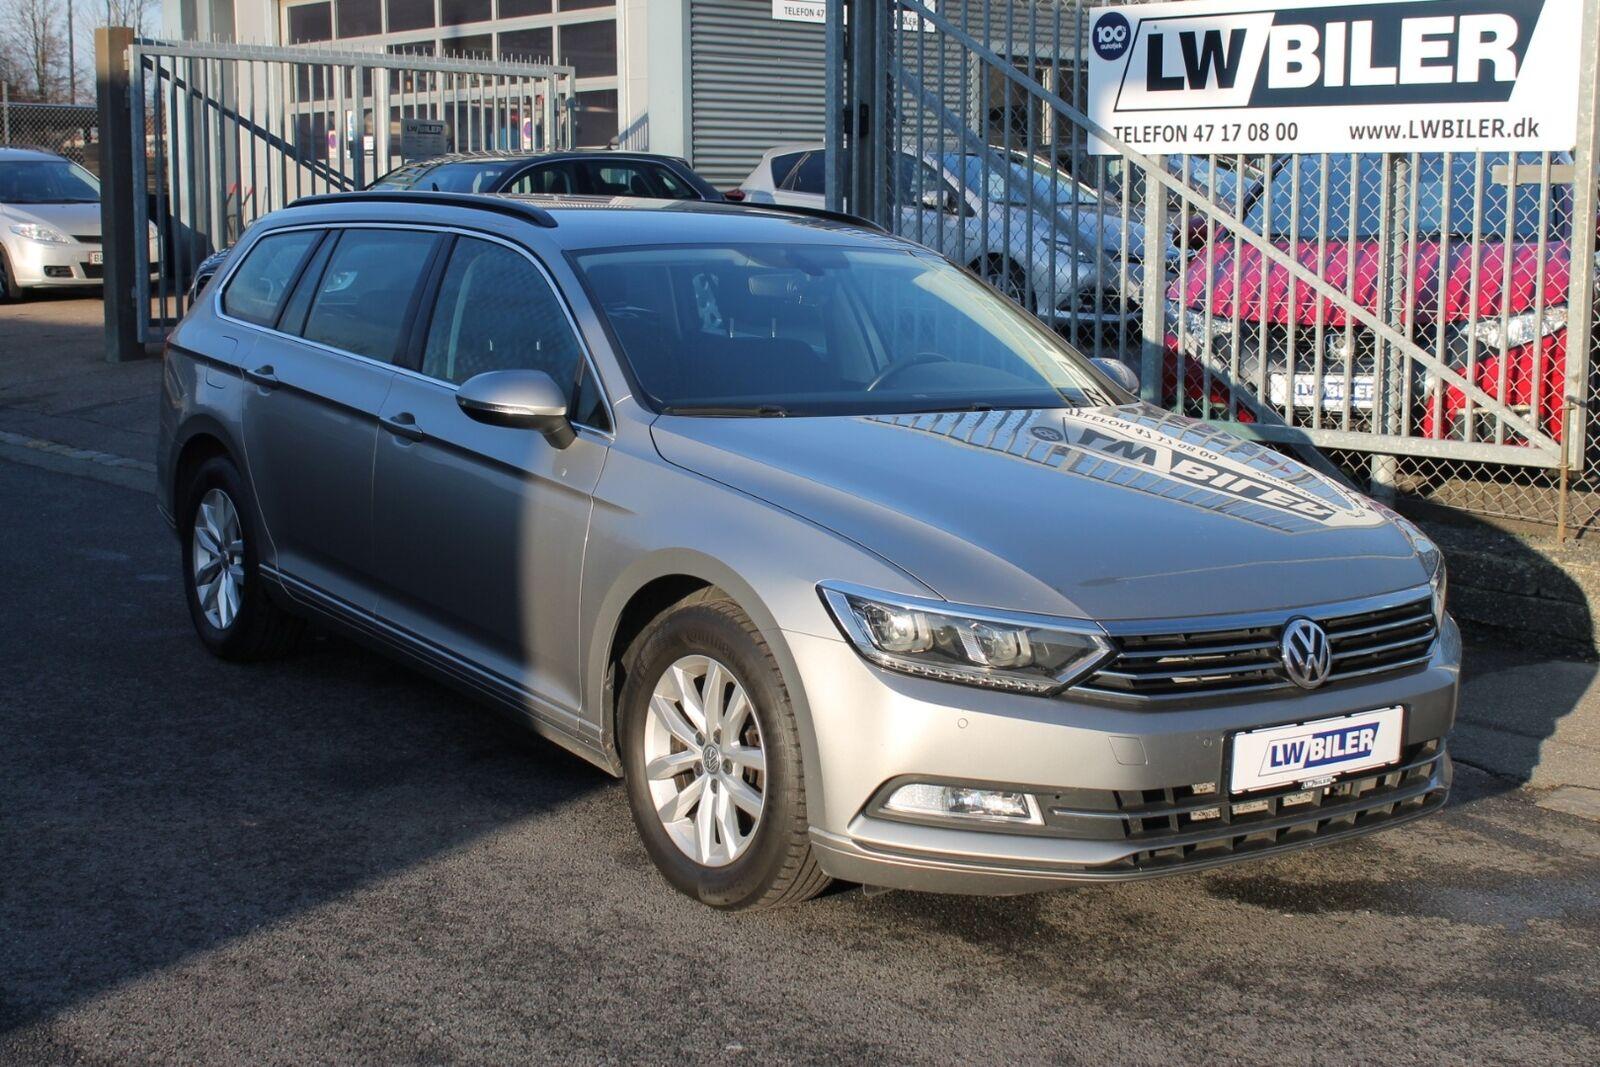 VW Passat 2,0 TDi 150 Comfortl. Vari. DSG 5d - 193.900 kr.